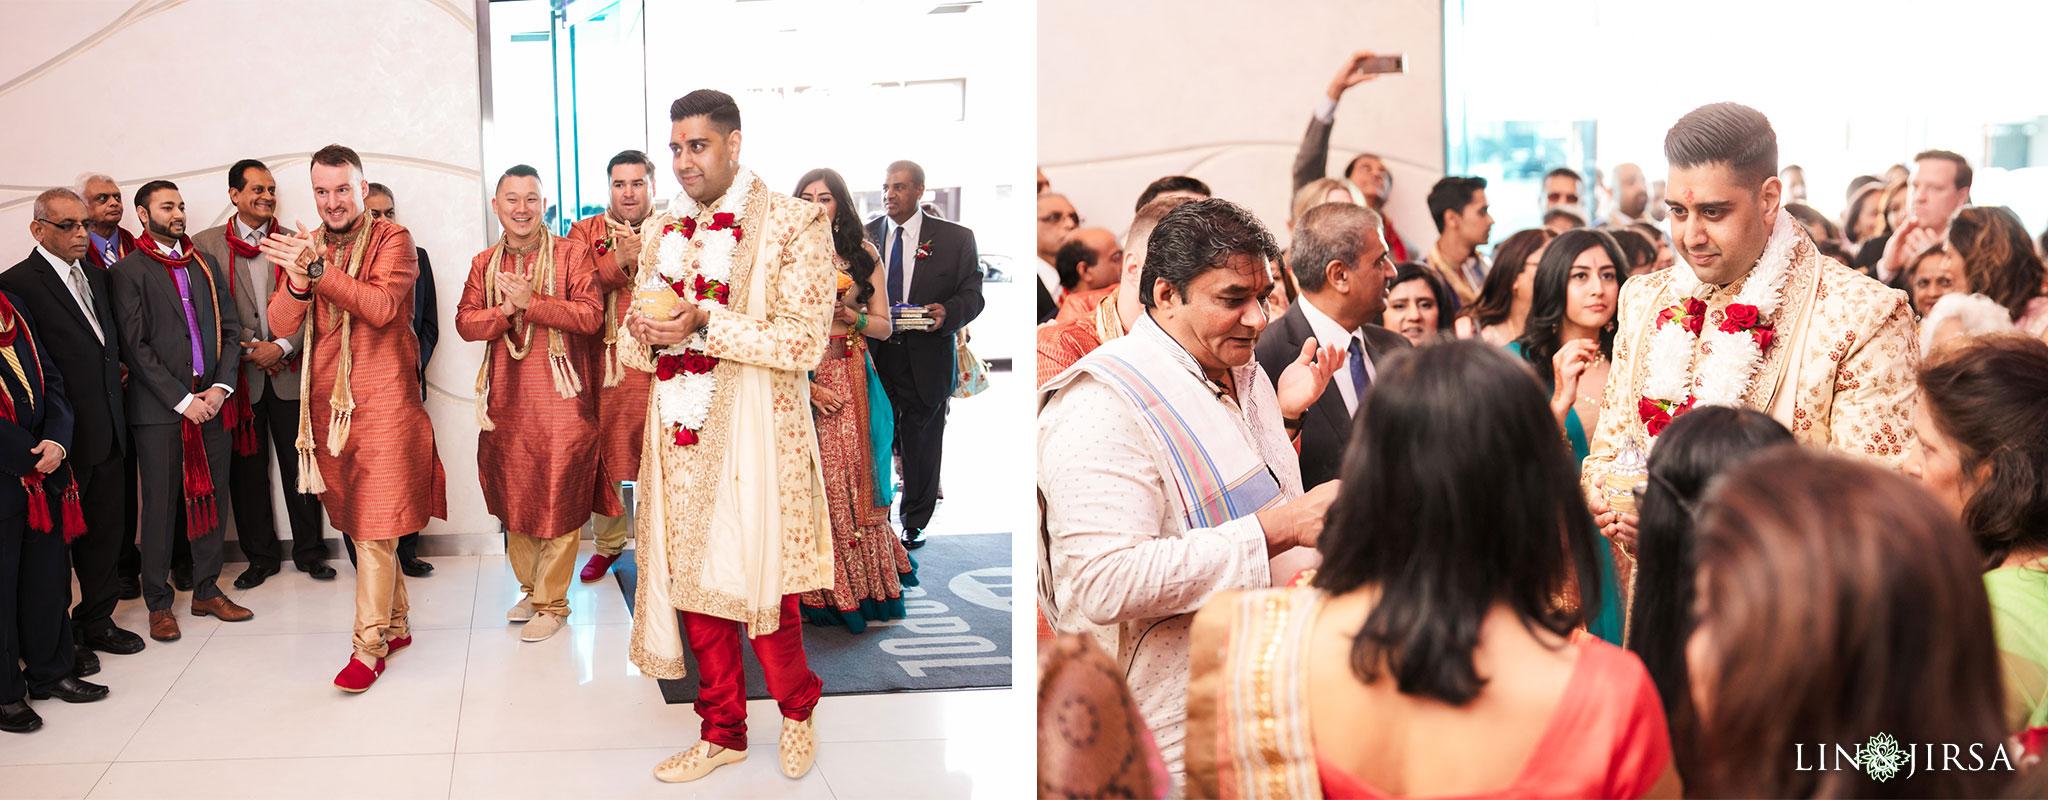 11 Metropol Glendale Indian Wedding Photography